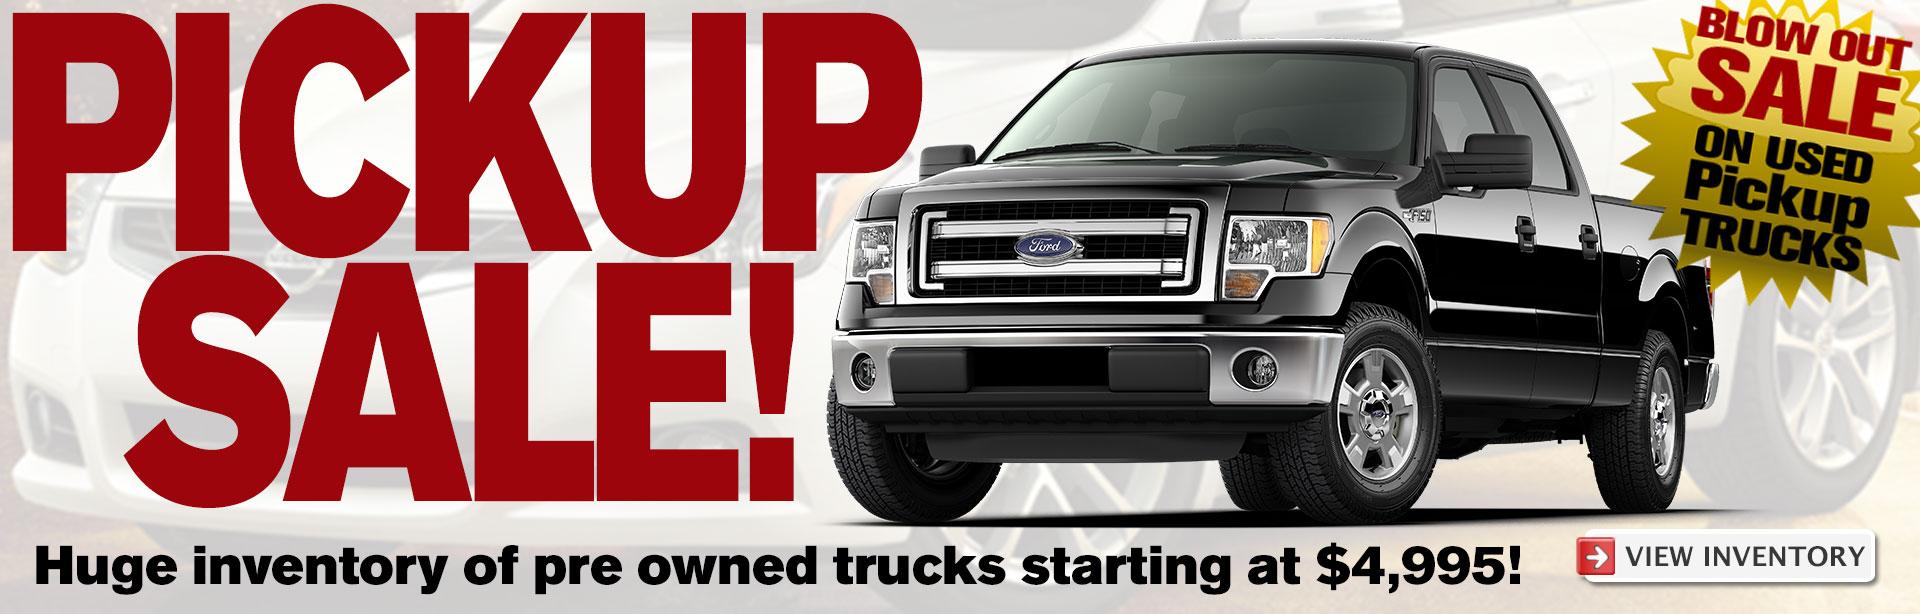 Pickup Truck Sale